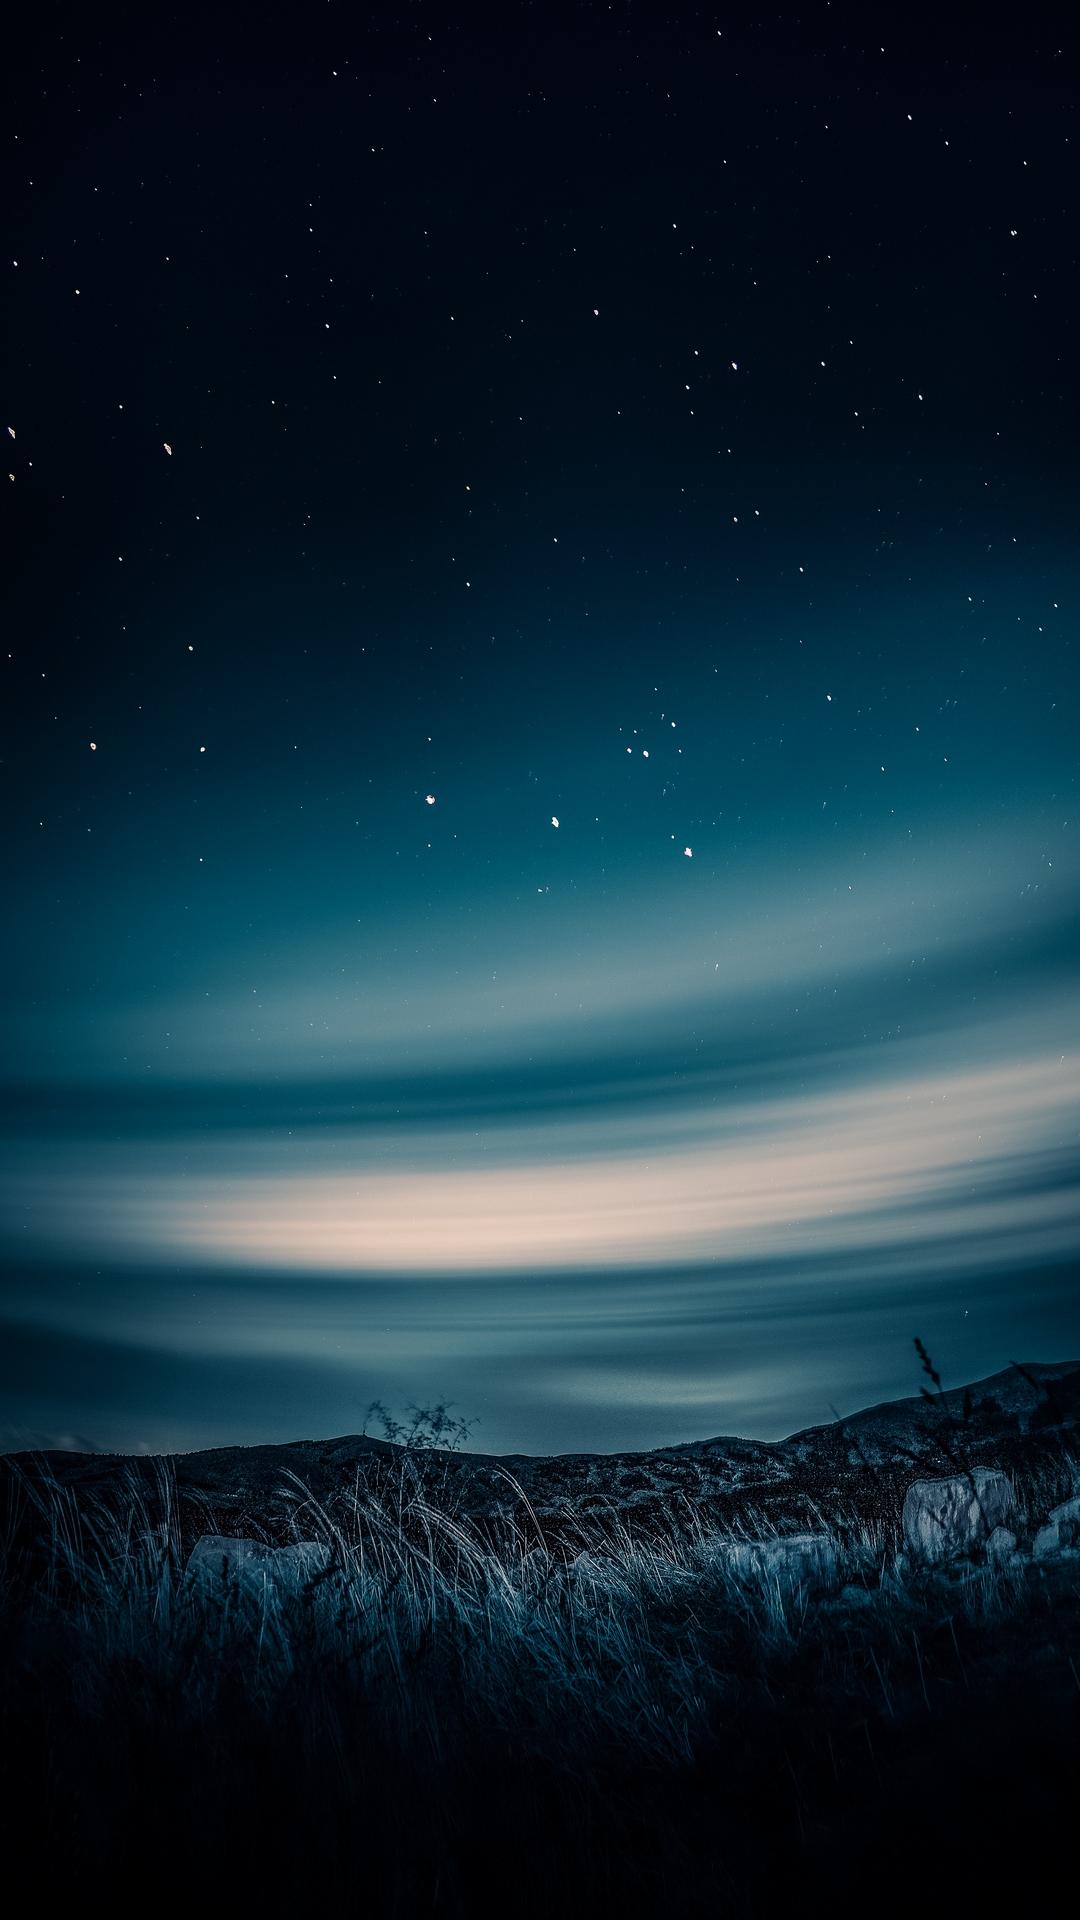 Starry Sky Horizon Night Wallpaper - [1080x1920]